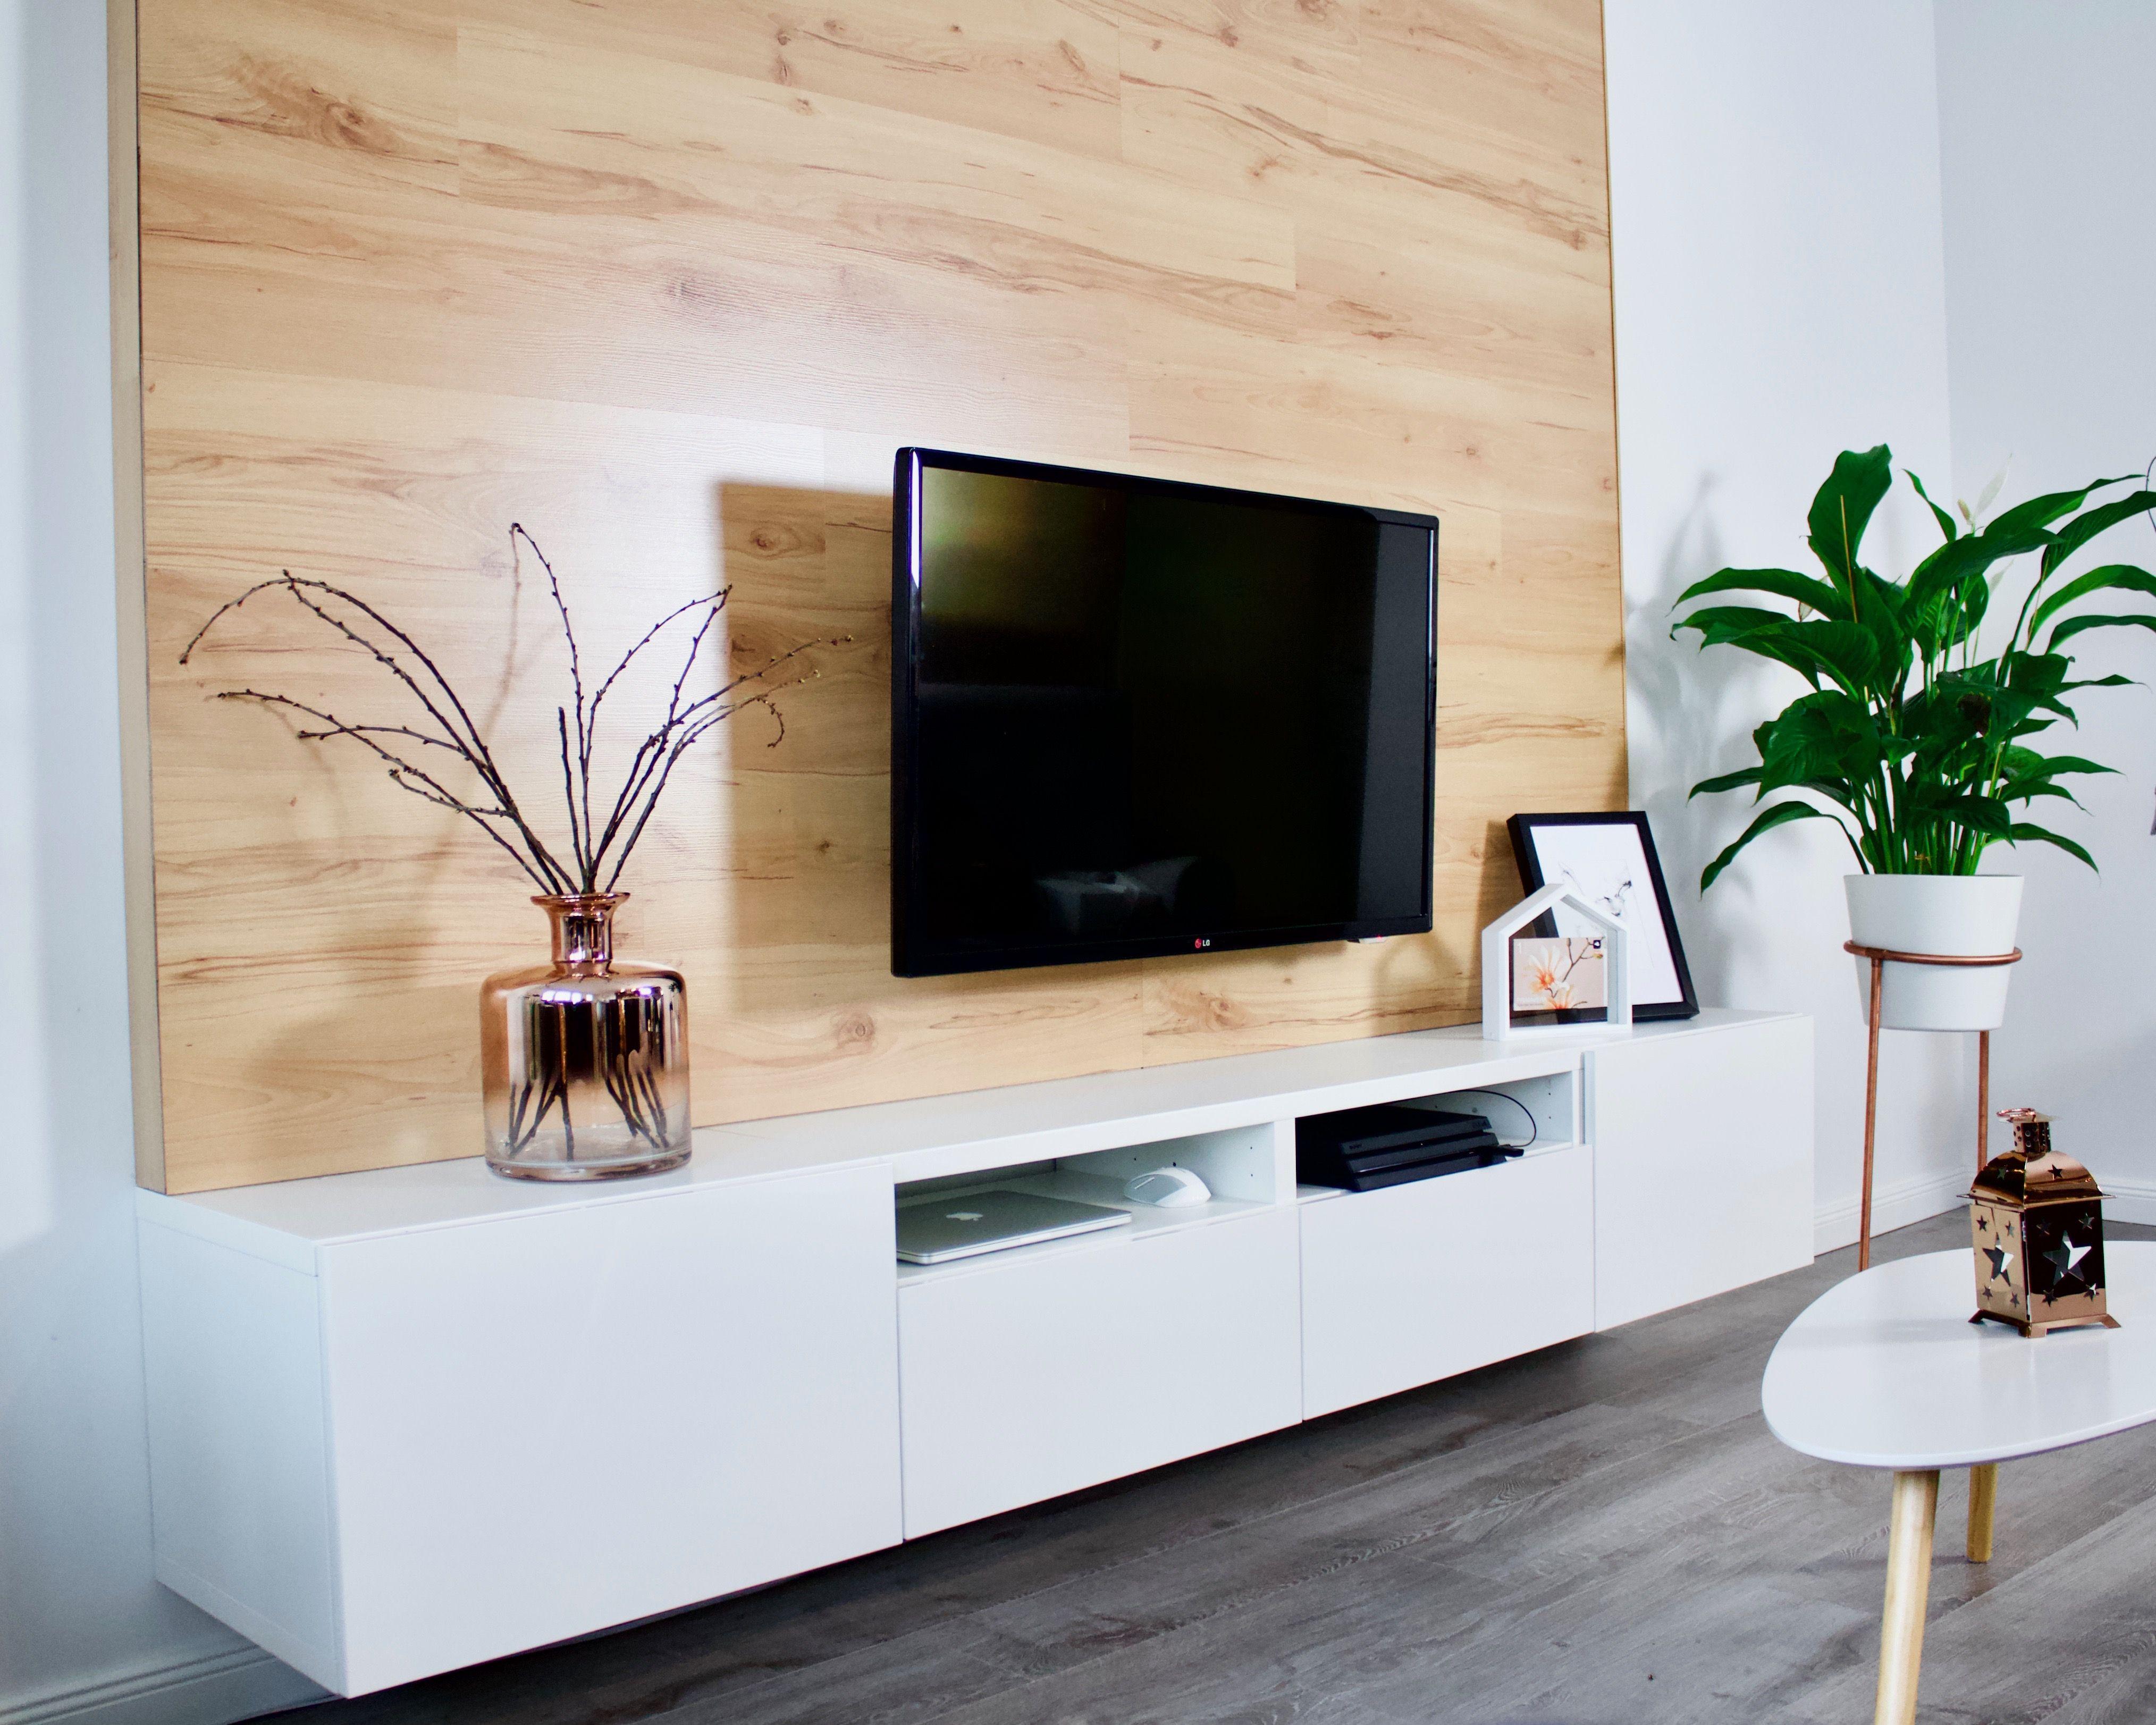 Diy Tv Wand Aus Holz Bauen Selfmade Interior Tv Wand Holz Wohnzimmer Tv Wand Ideen Diy Holzwand